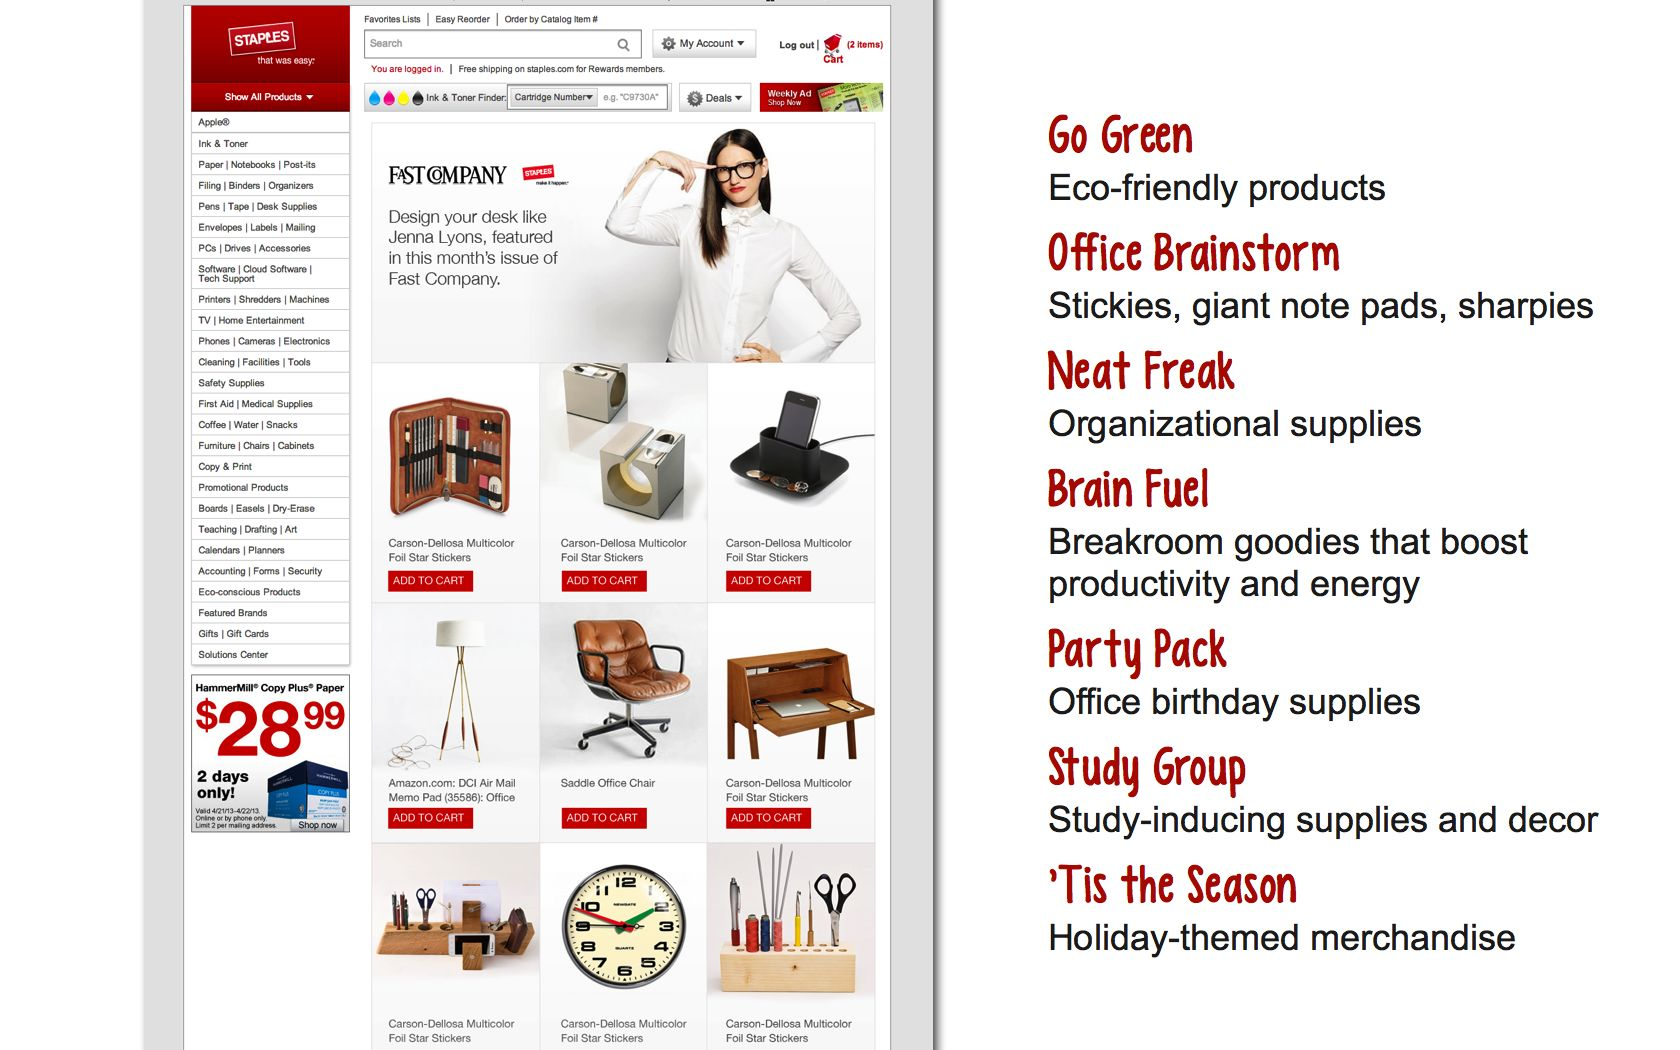 Staples_Digital-Ideas_043.031.jpg